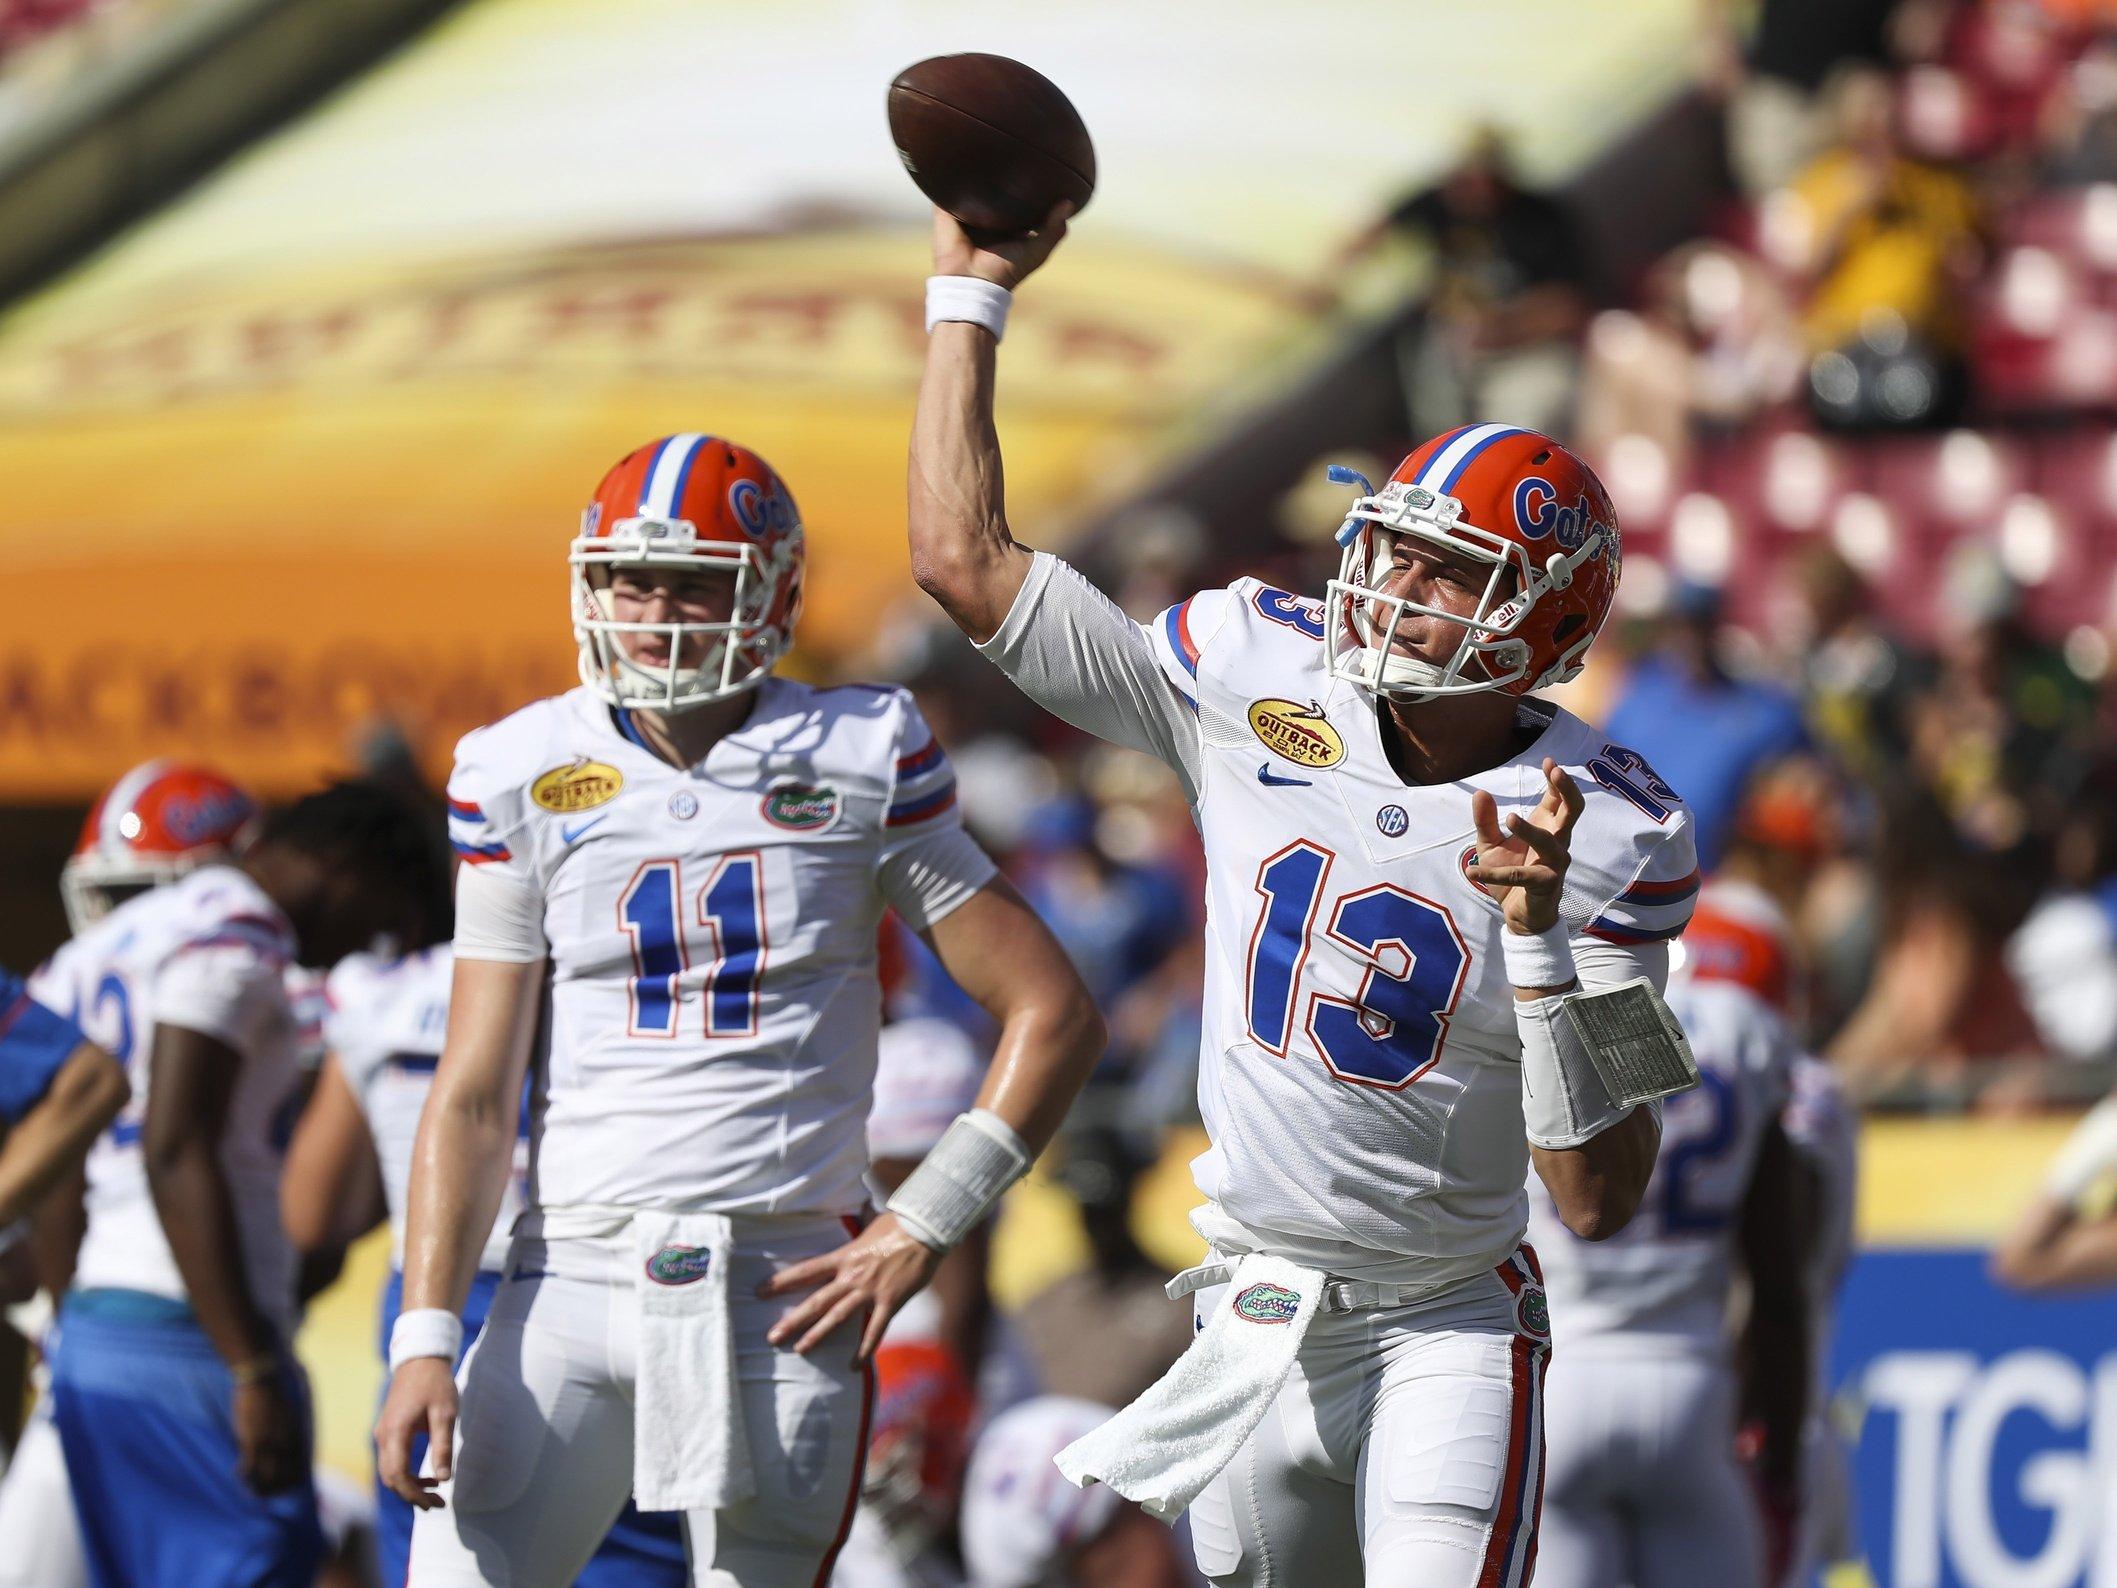 [2022] SEC Quarterback Battle Analysis Part I